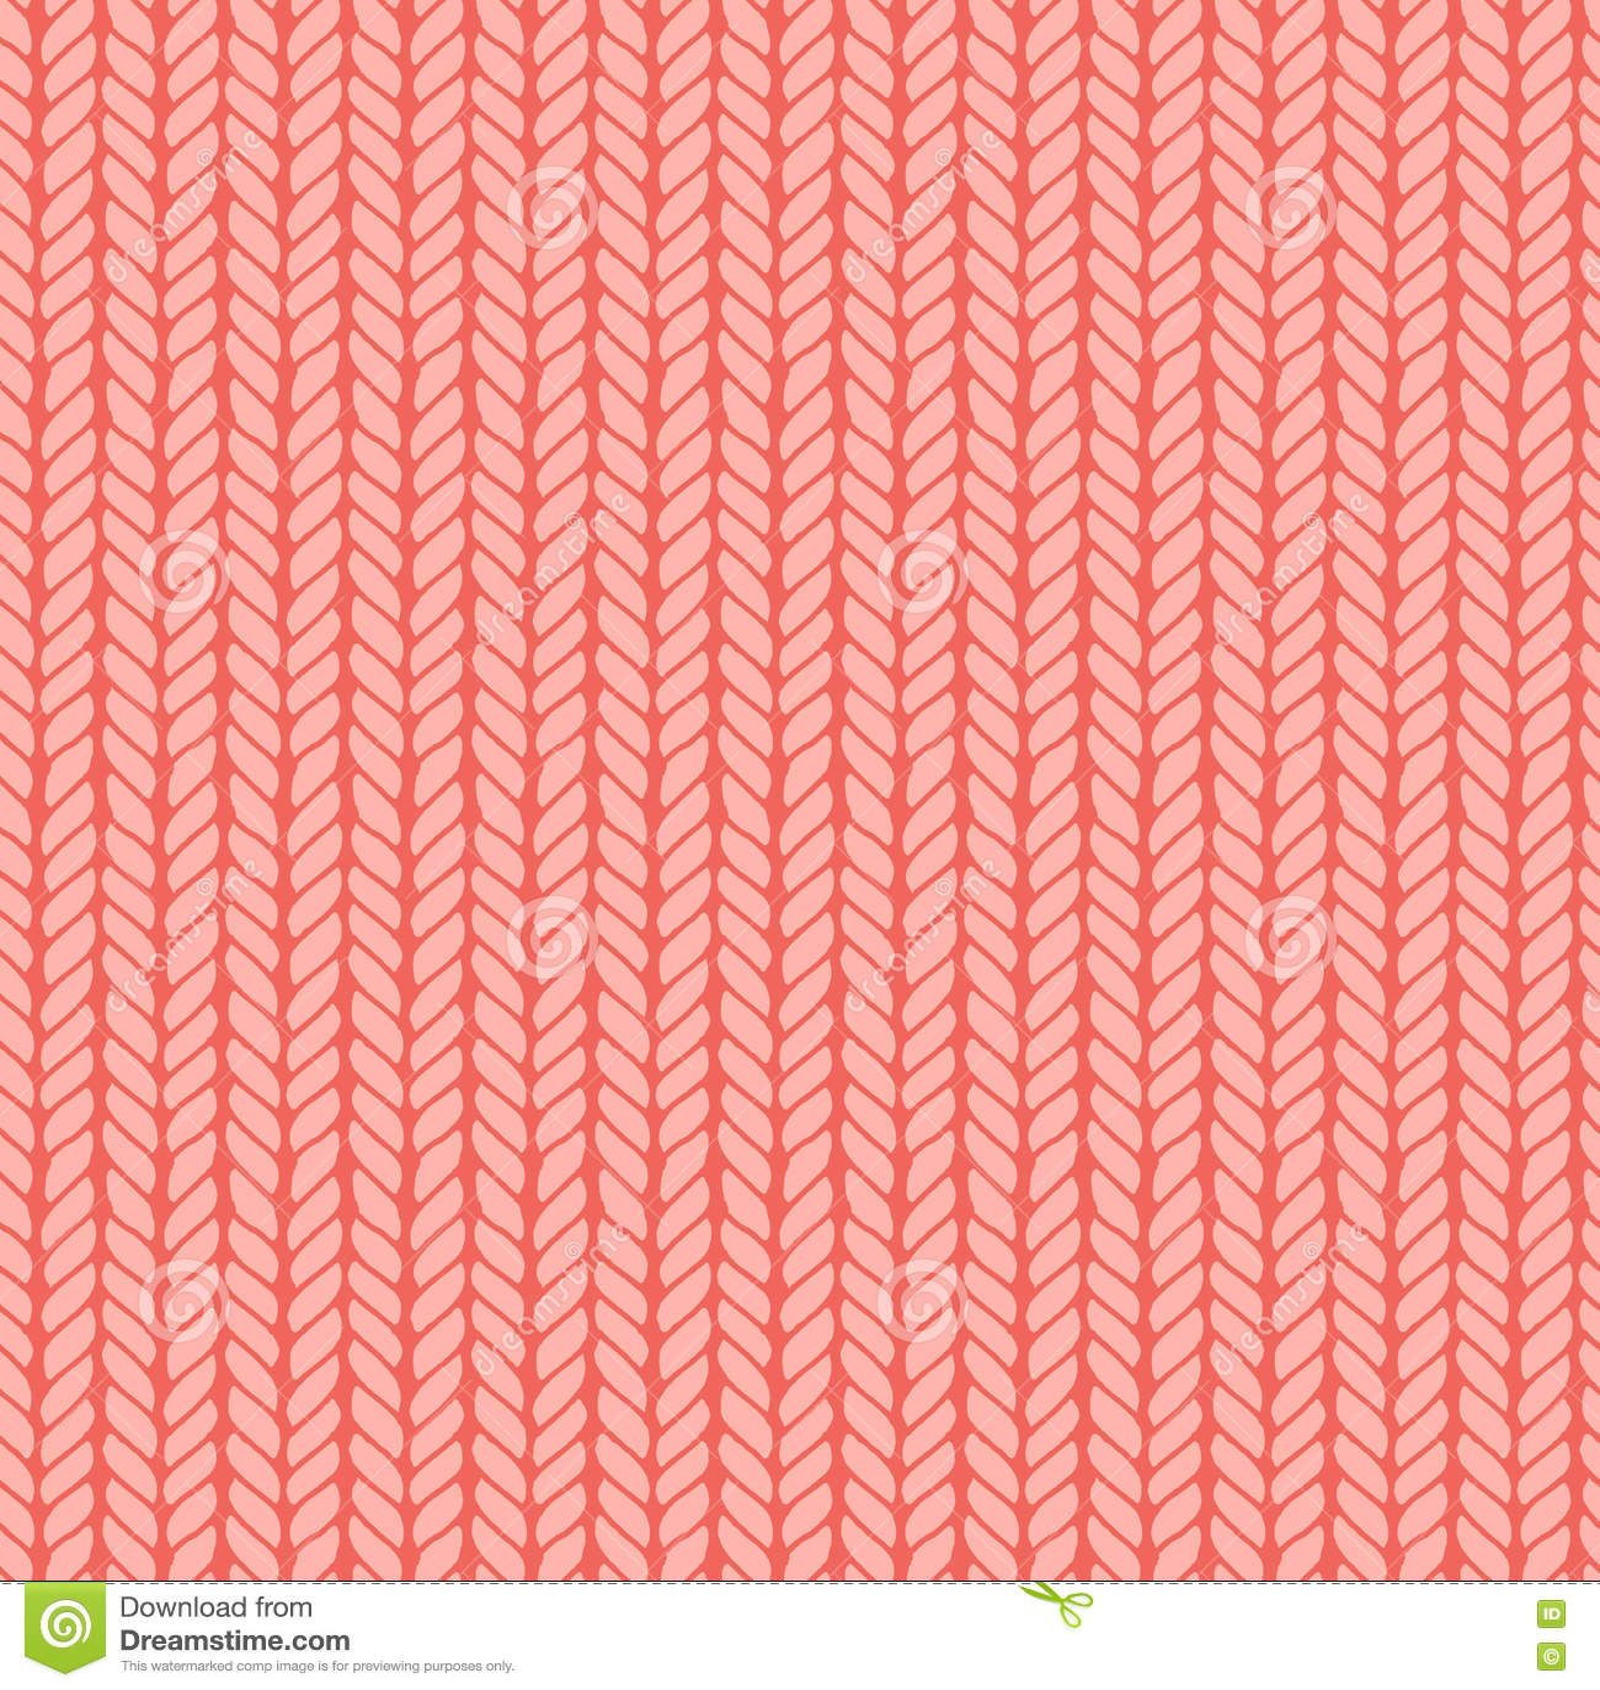 Decorative Knitting Braids Seamless Pattern. Stock Vector ...